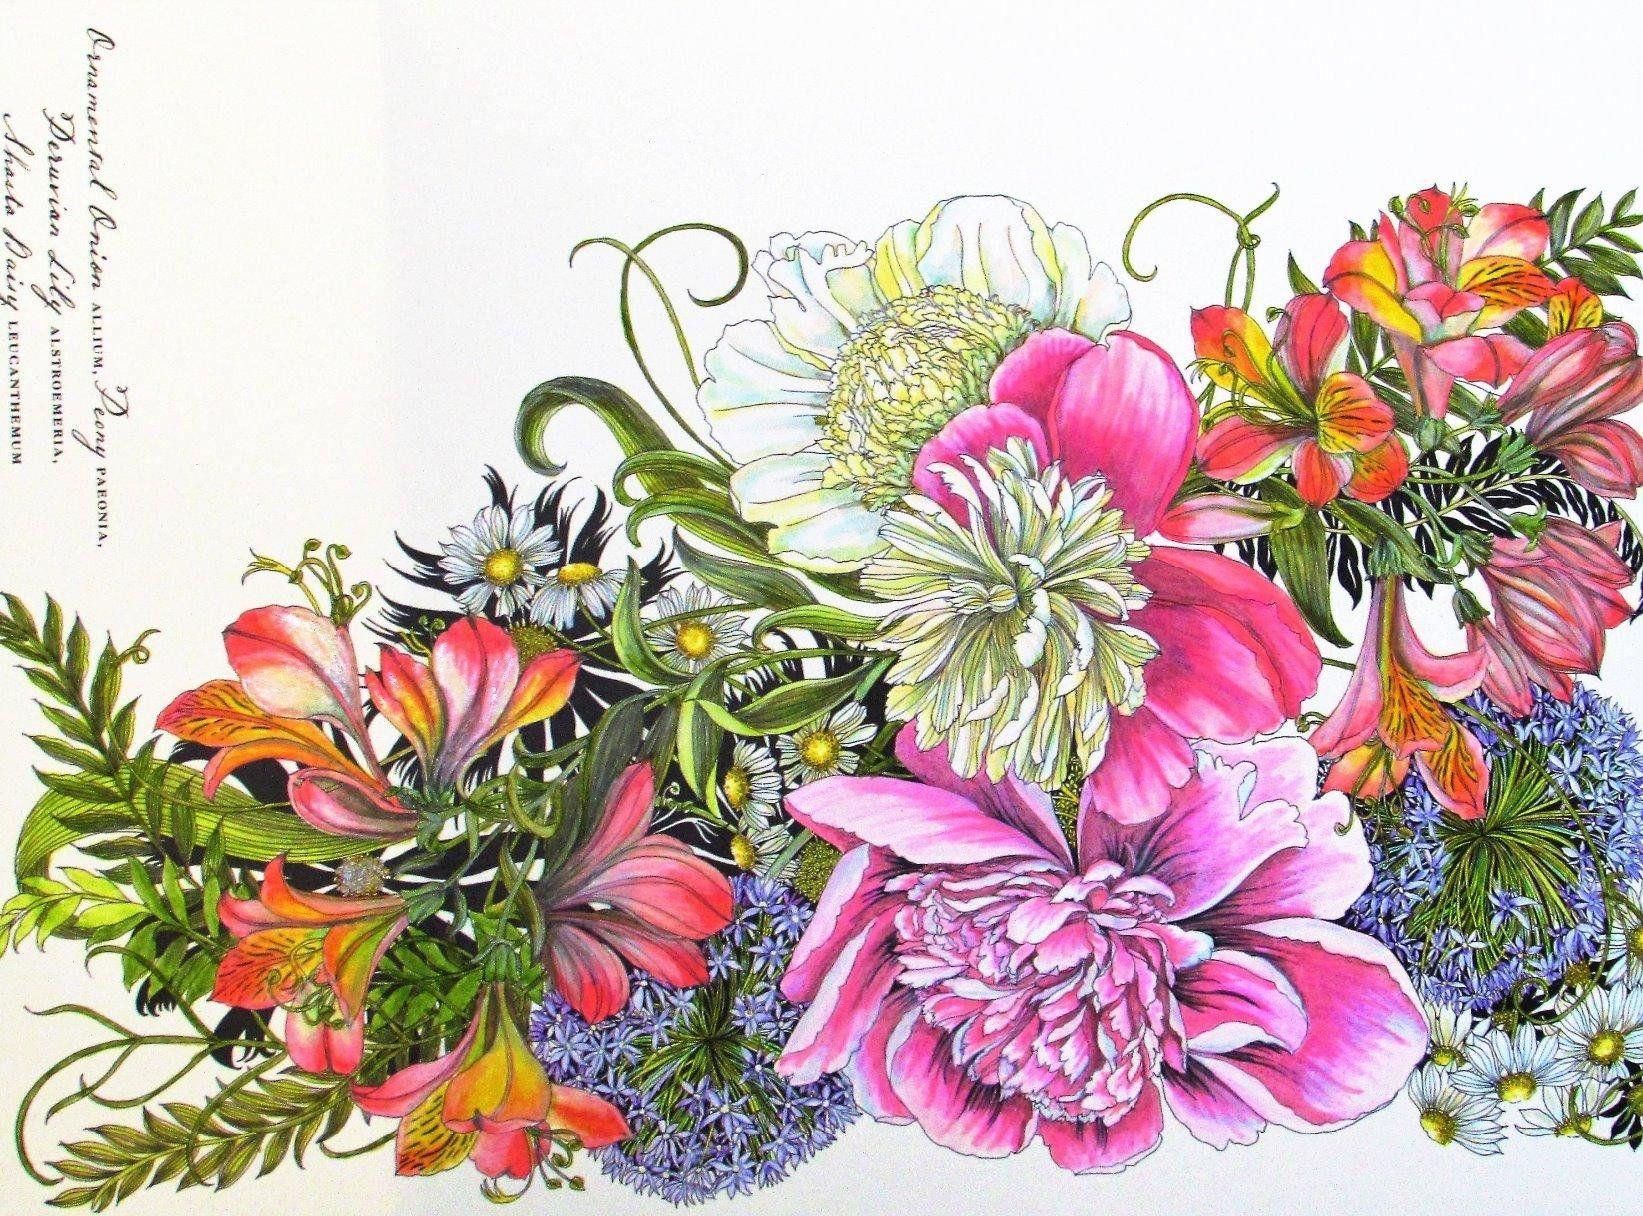 Color book for me - Floribunda A Flower Coloring Book Leila Duly 9781780677682 Amazonsmile Books